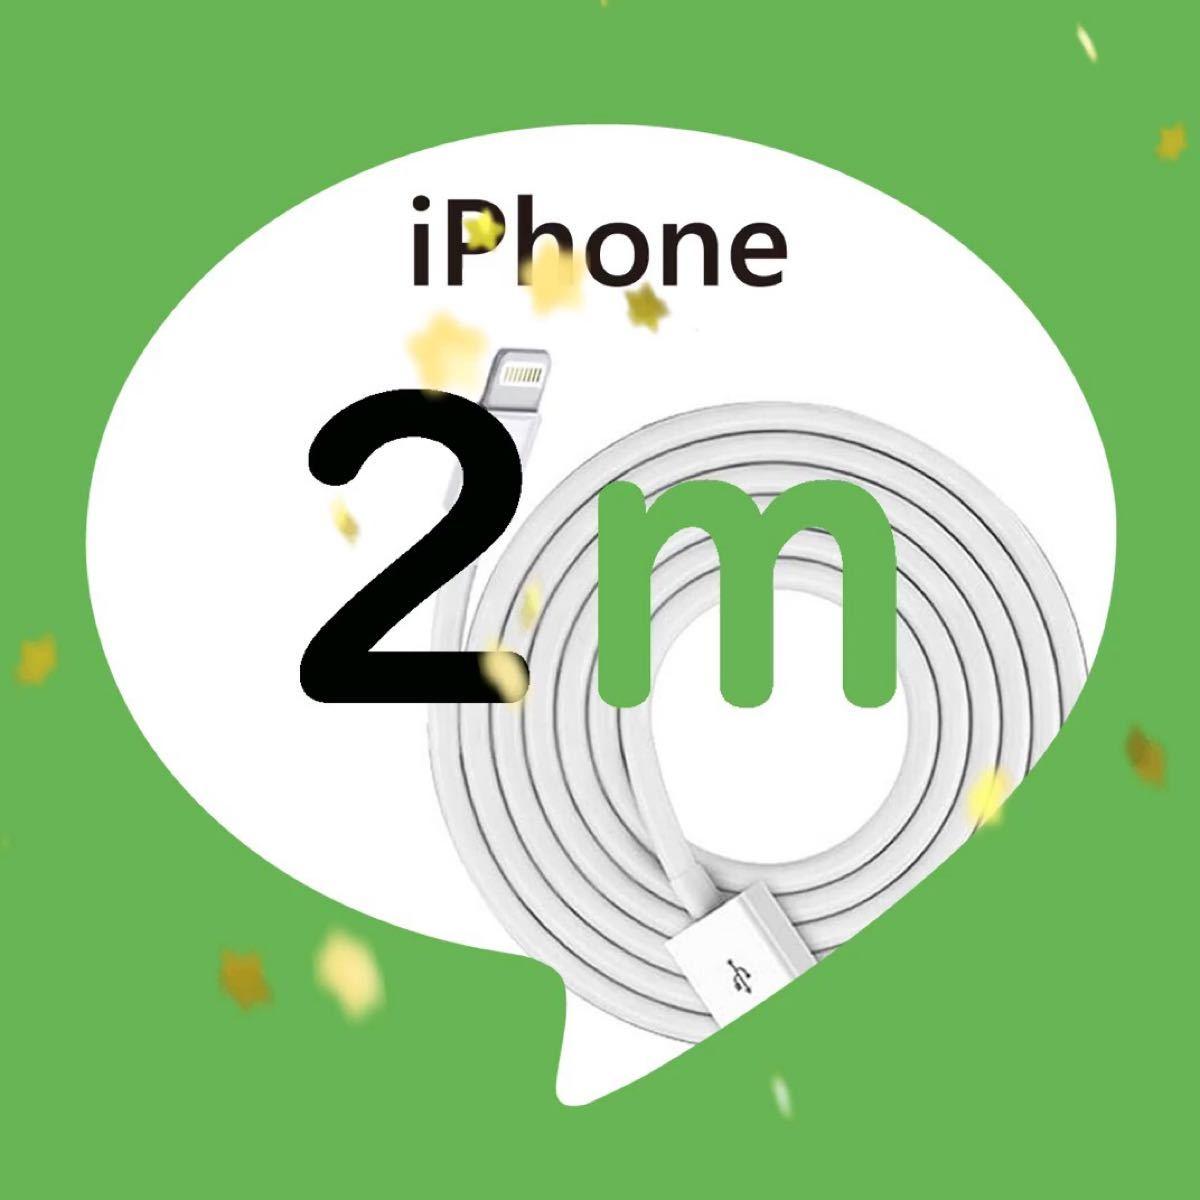 iPhone 充電器 充電ケーブル コード lightning cable ライトニングケーブル 急速充電 高速充電 データ転送